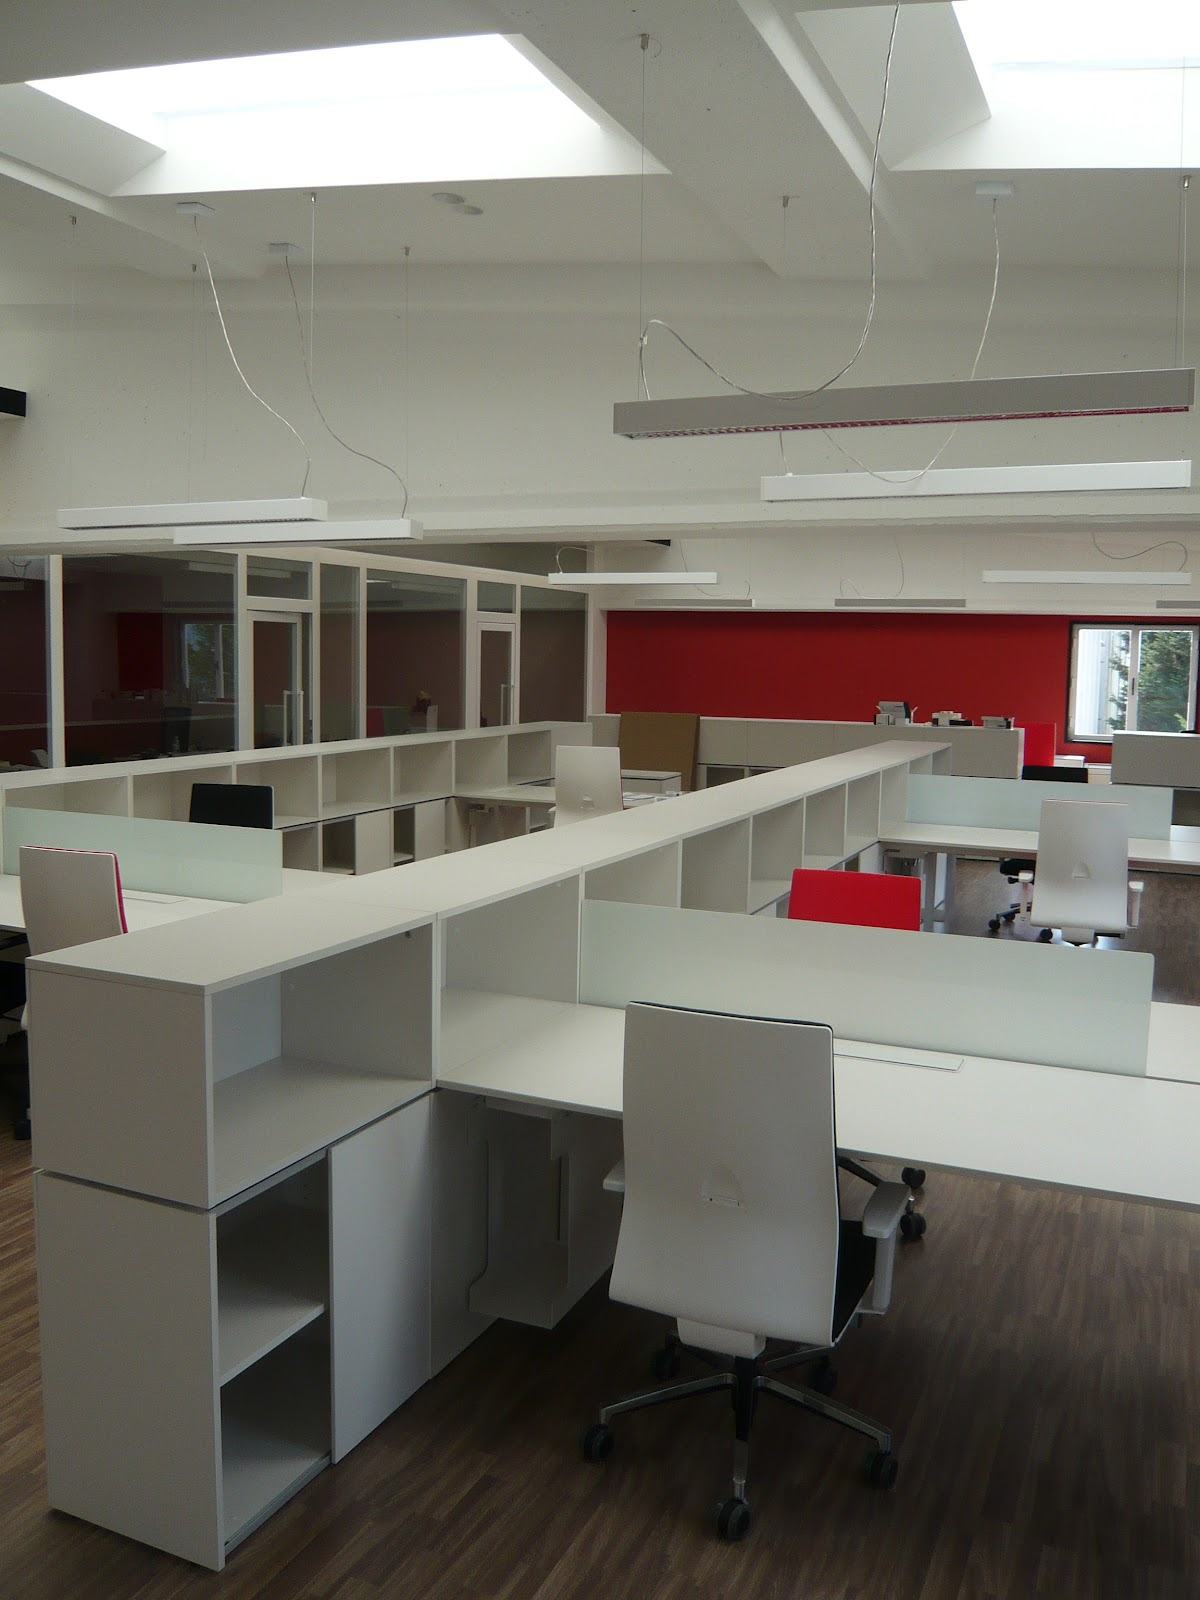 Nat dise o de espacios reforma de oficinas irua tech for Reformas de oficinas